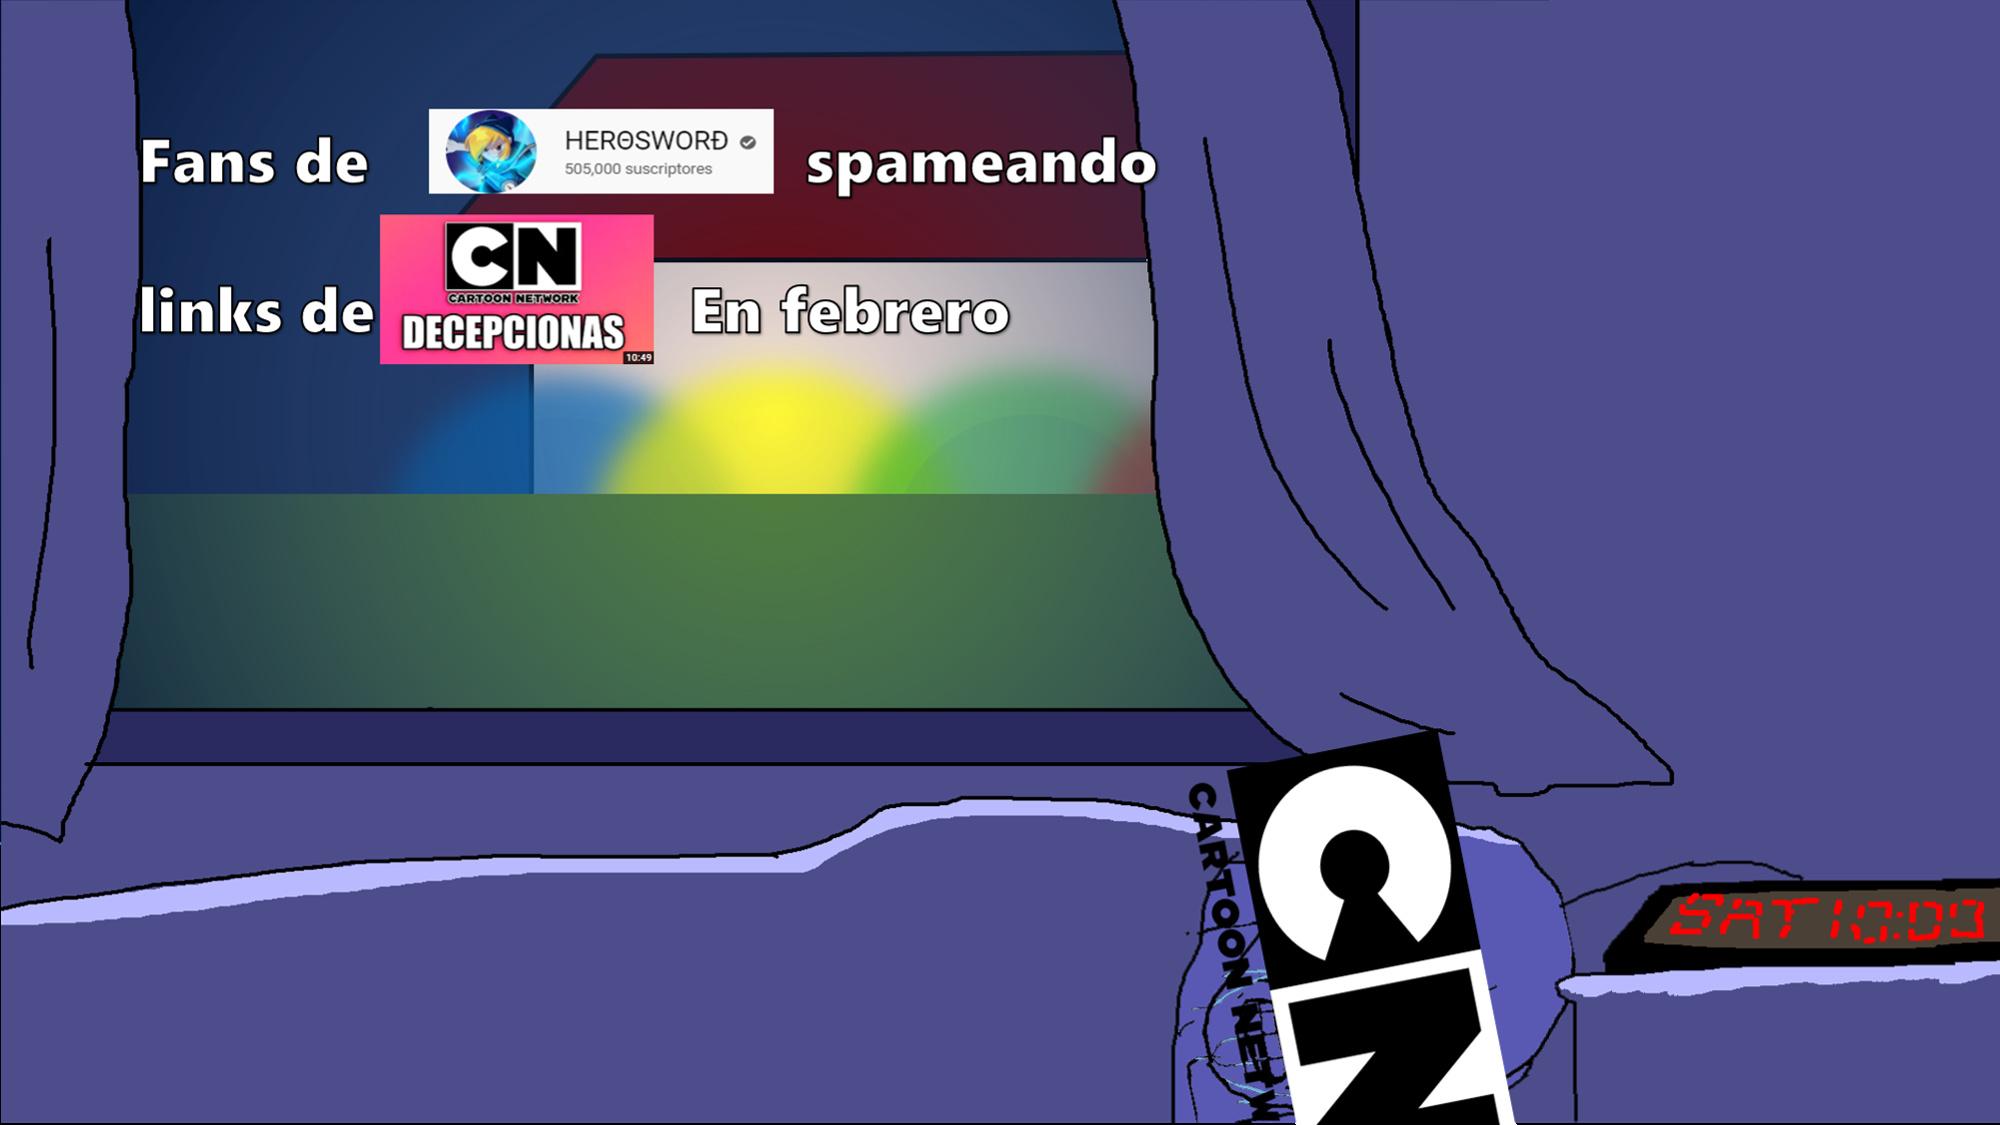 Pobre cartoon network - meme